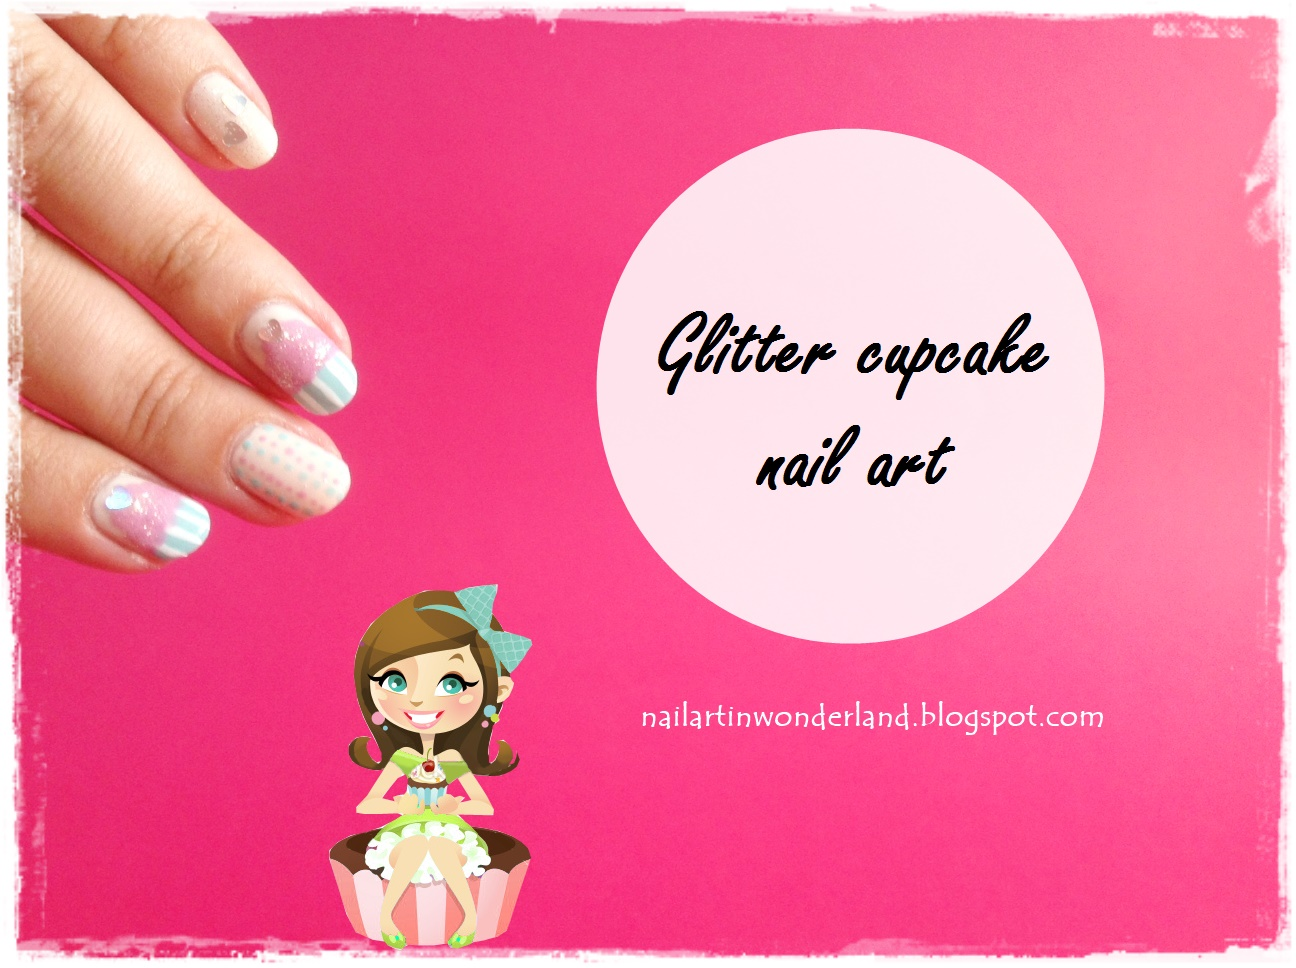 Glitter cupcake nail art